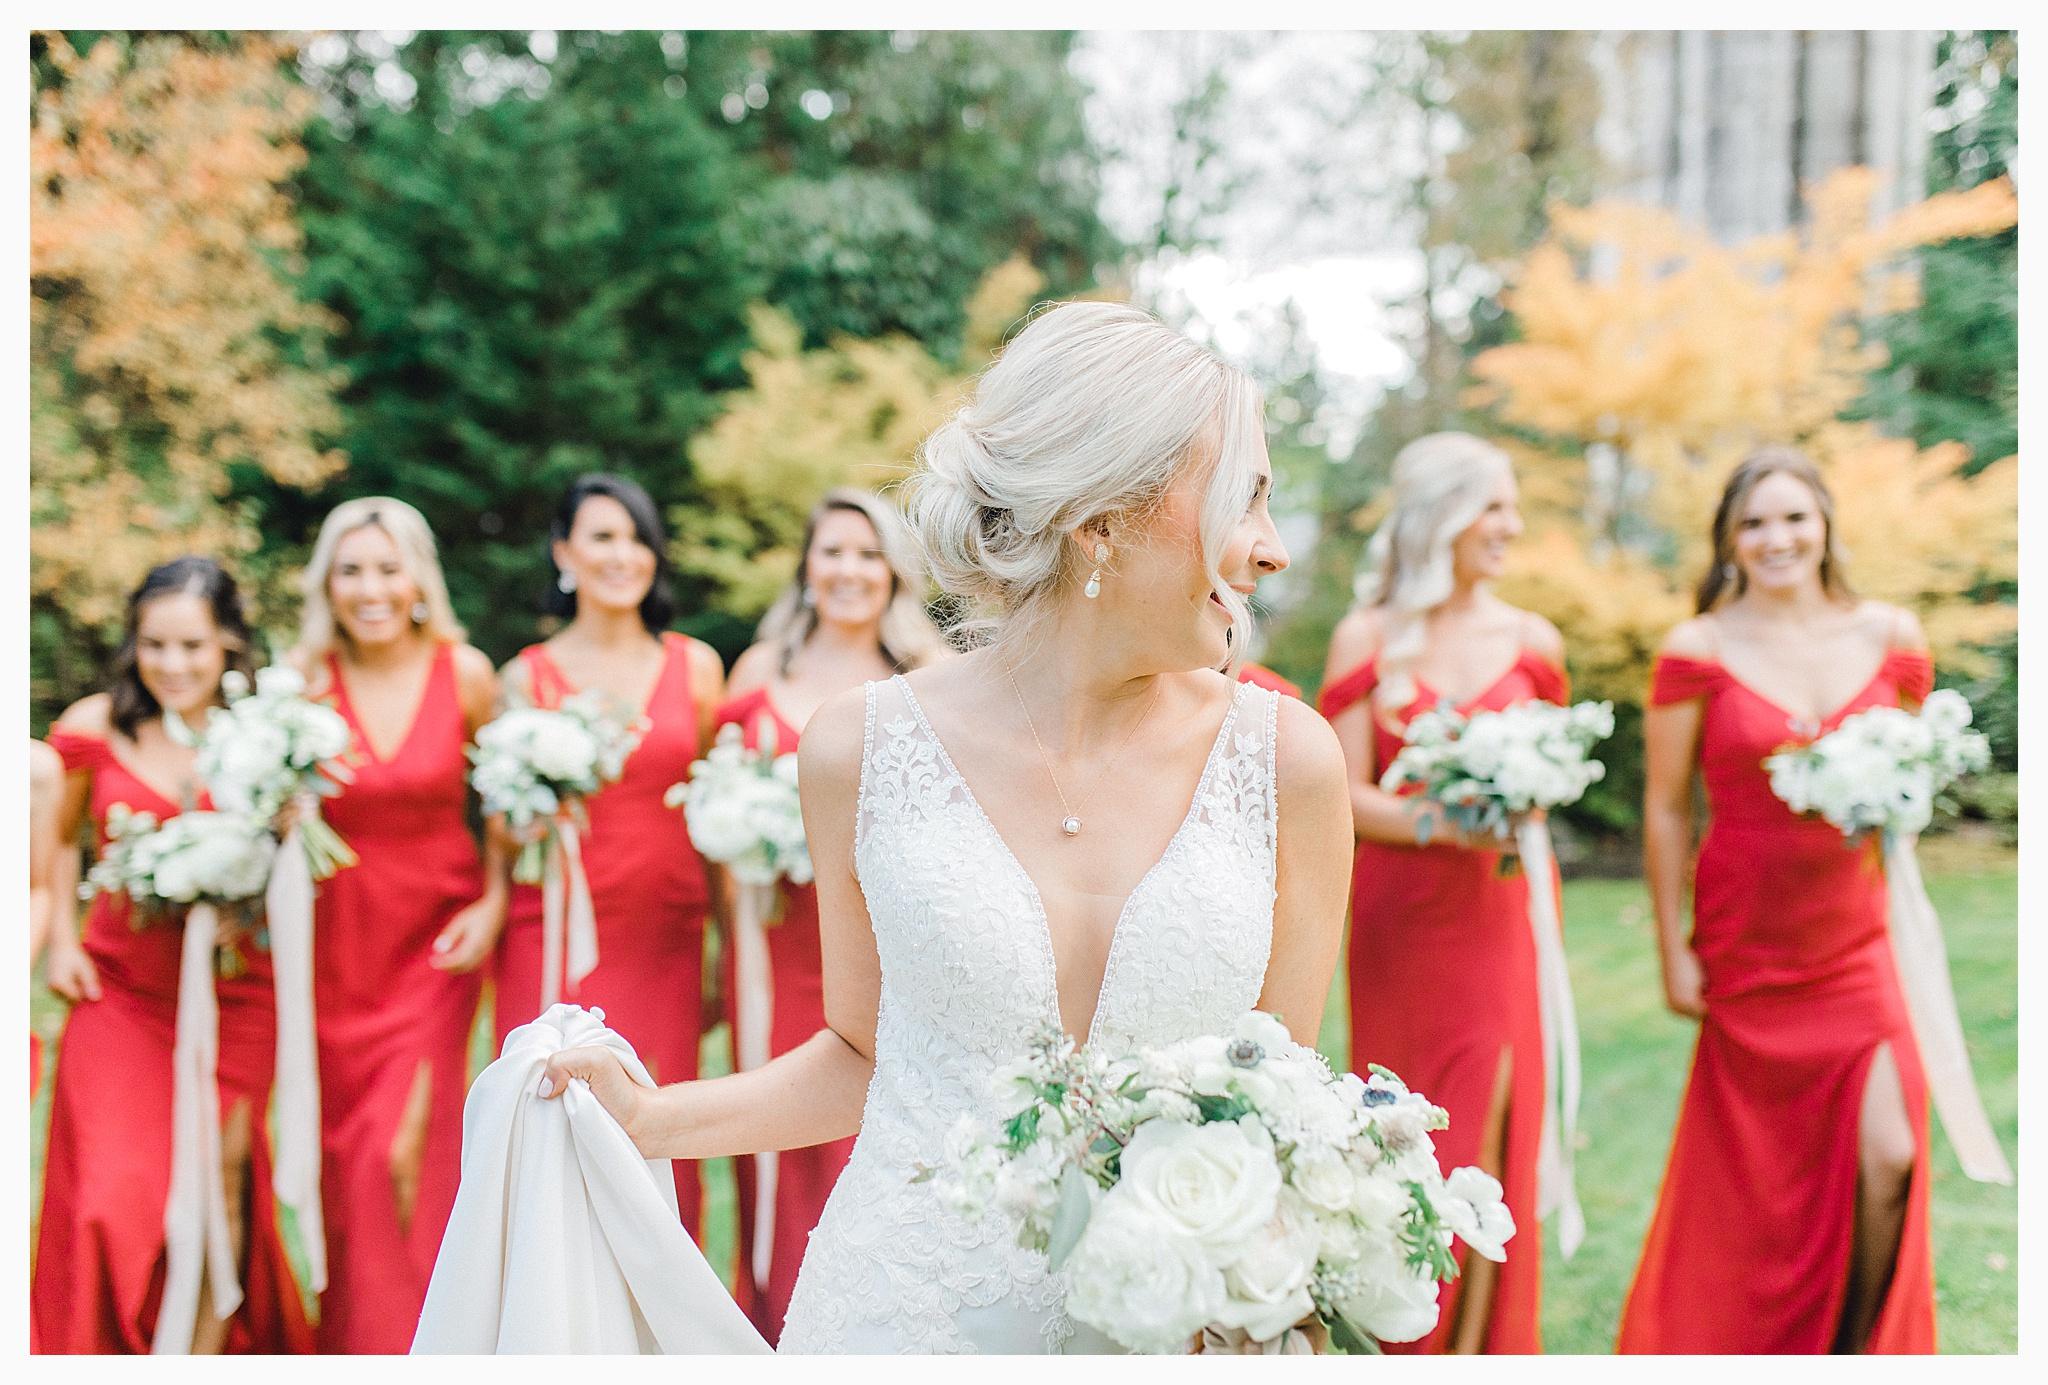 Emma Rose Company Light and Airy Wedding Photographer, Beautiful fall wedding at Rock Creek Gardens Venue in Puyallup, Washington._0053.jpg